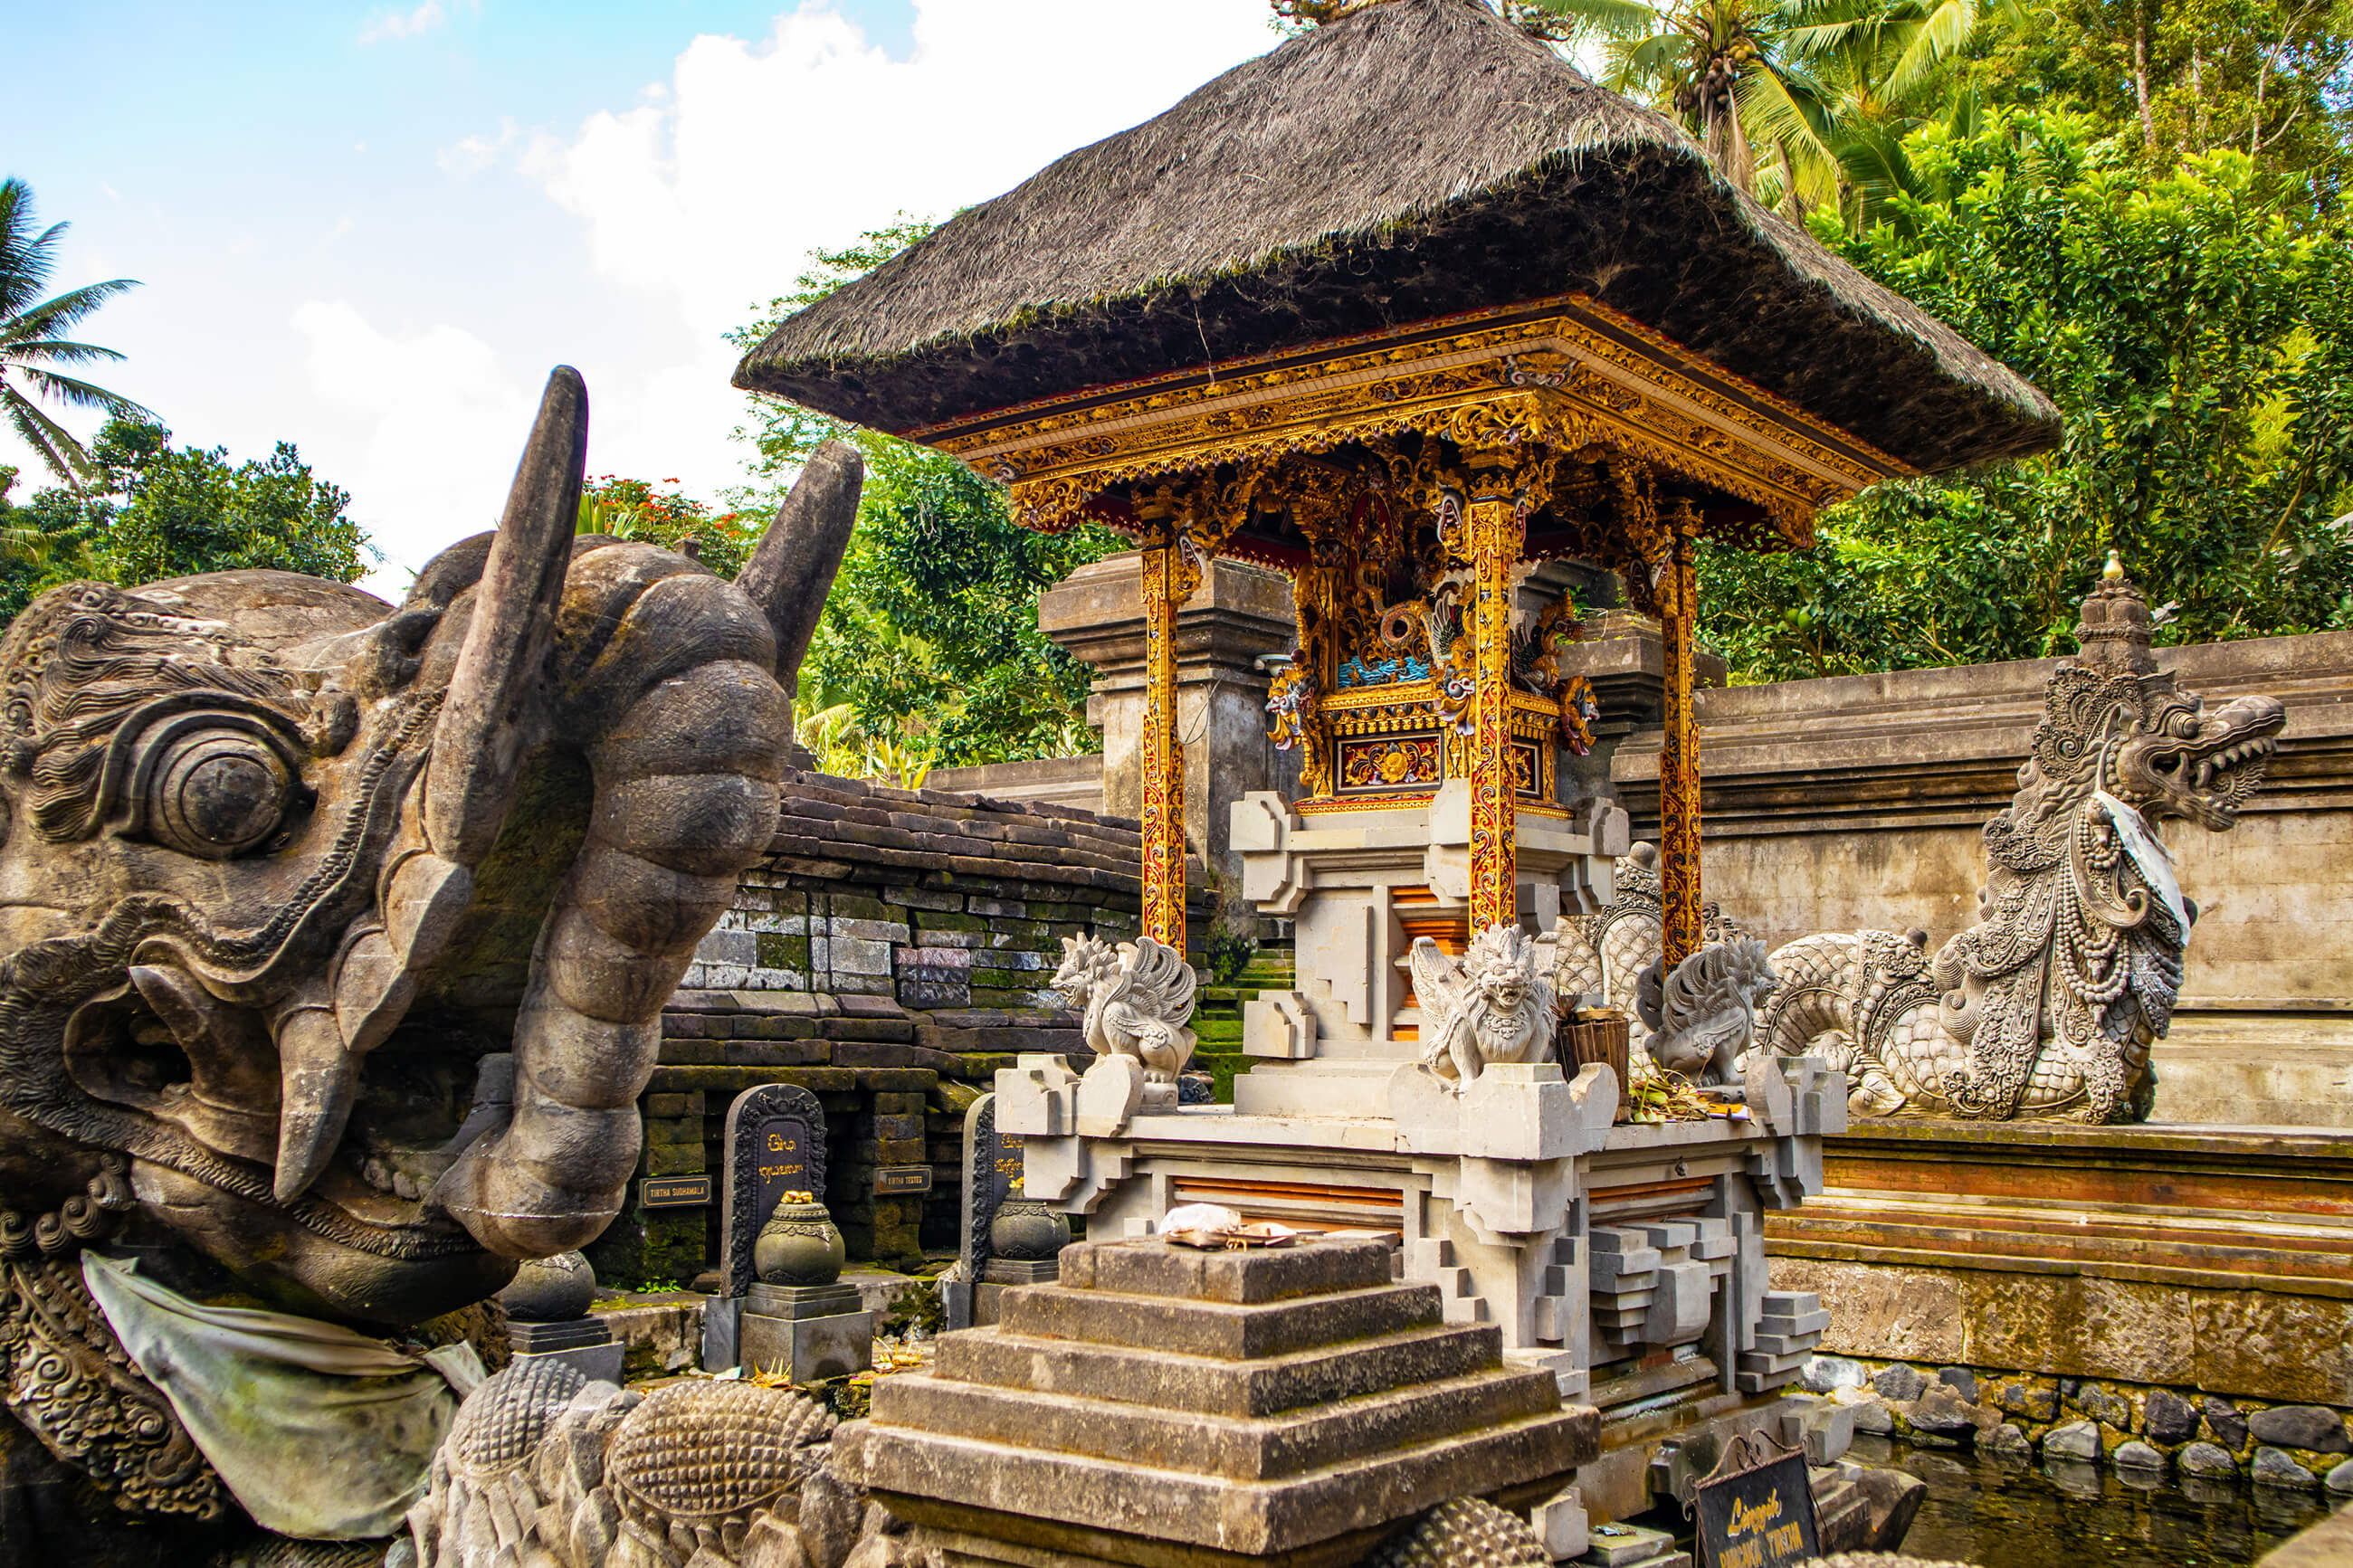 https://bubo.sk/uploads/galleries/7339/tomashornak_indonezia_bali_img_0456-1.jpg